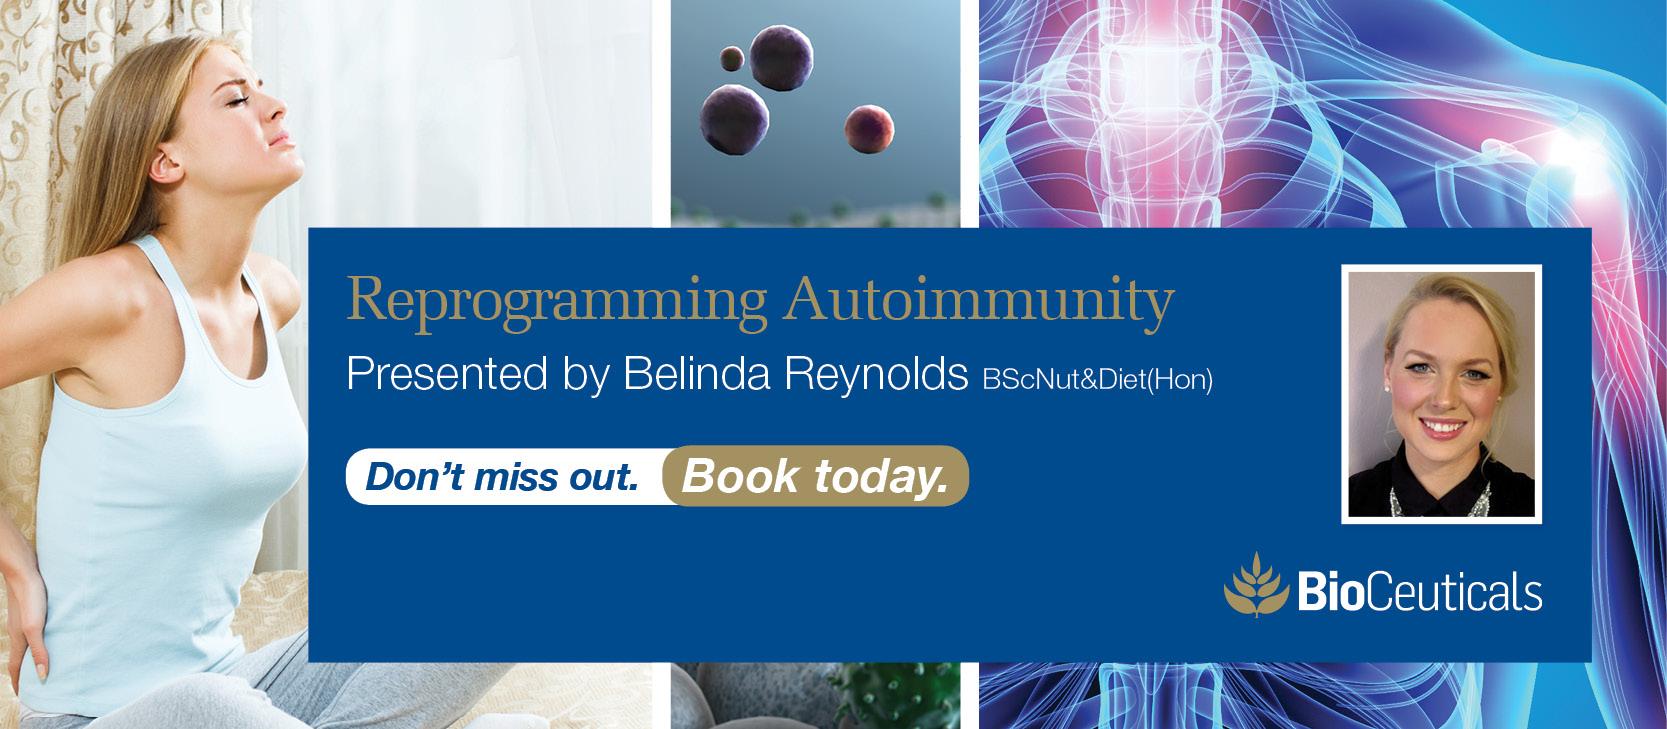 ReprogrammingAutoimmunity-Sydney.jpg